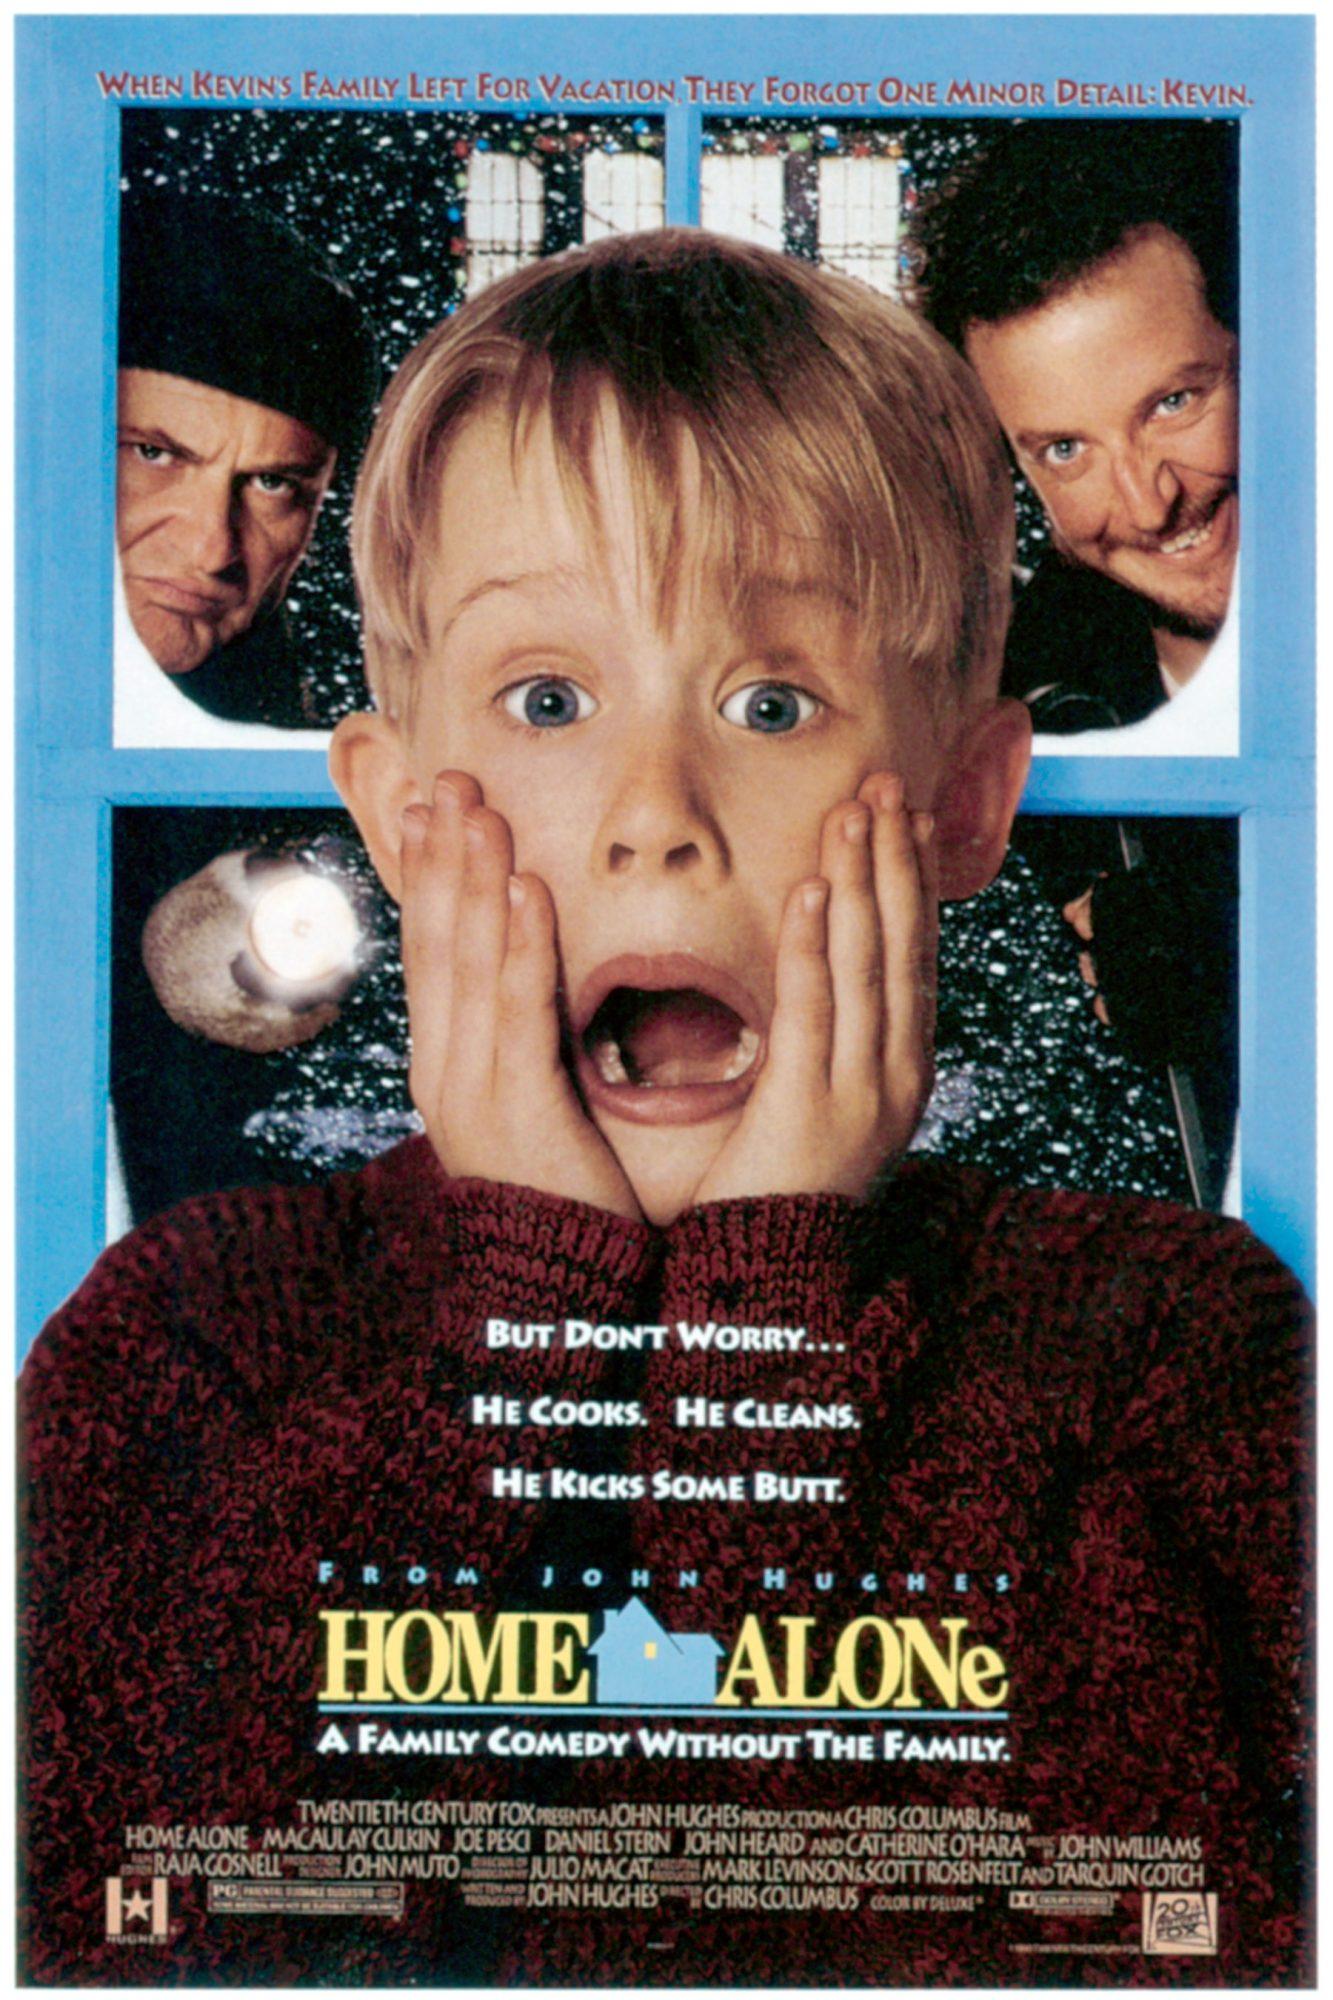 HOME ALONE, from left: Joe Pesci, Macaulay Culkin, Daniel Stern, 1990, TM and Copyright ©20th Centur